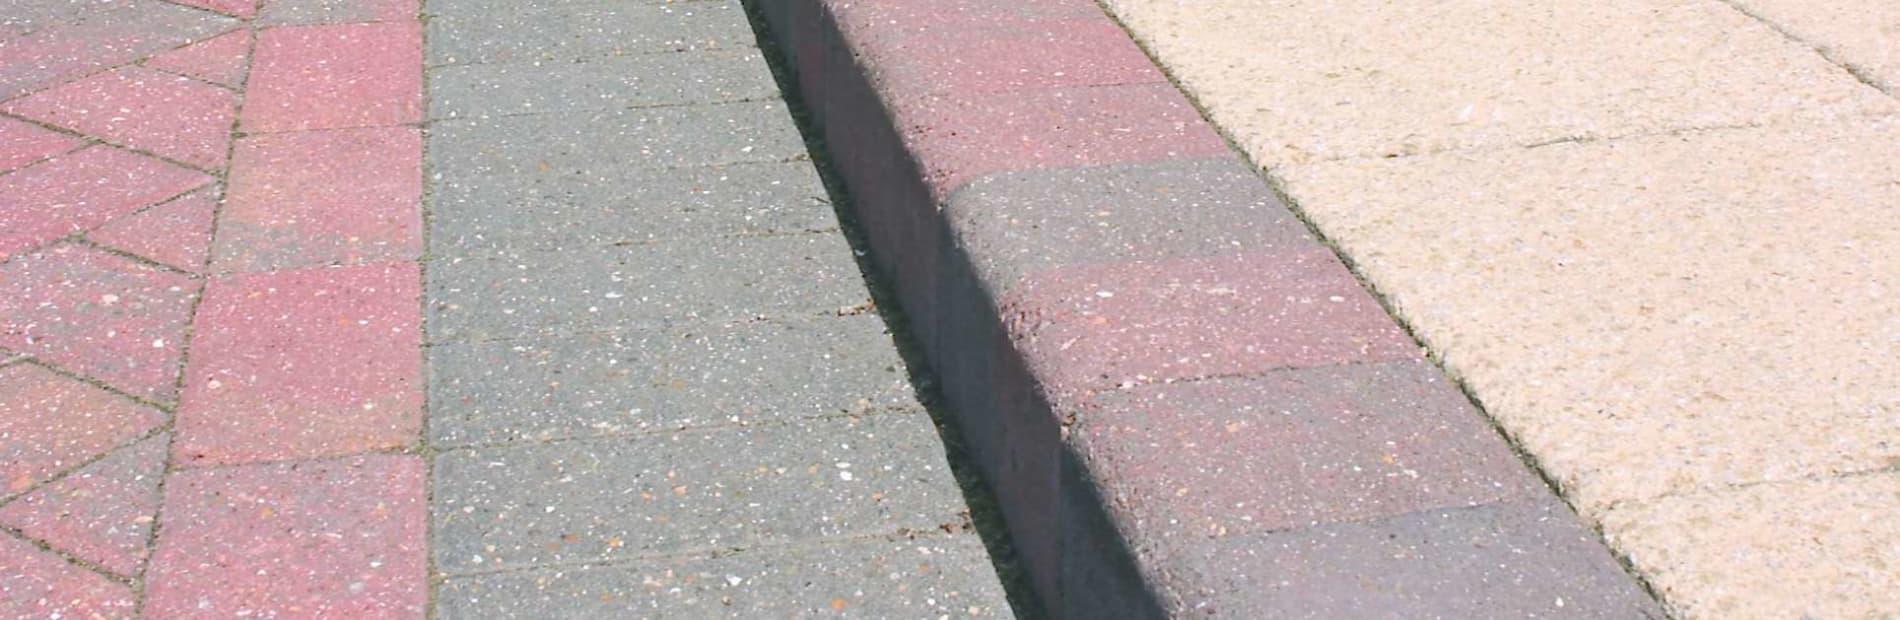 British standard kerb in a car park